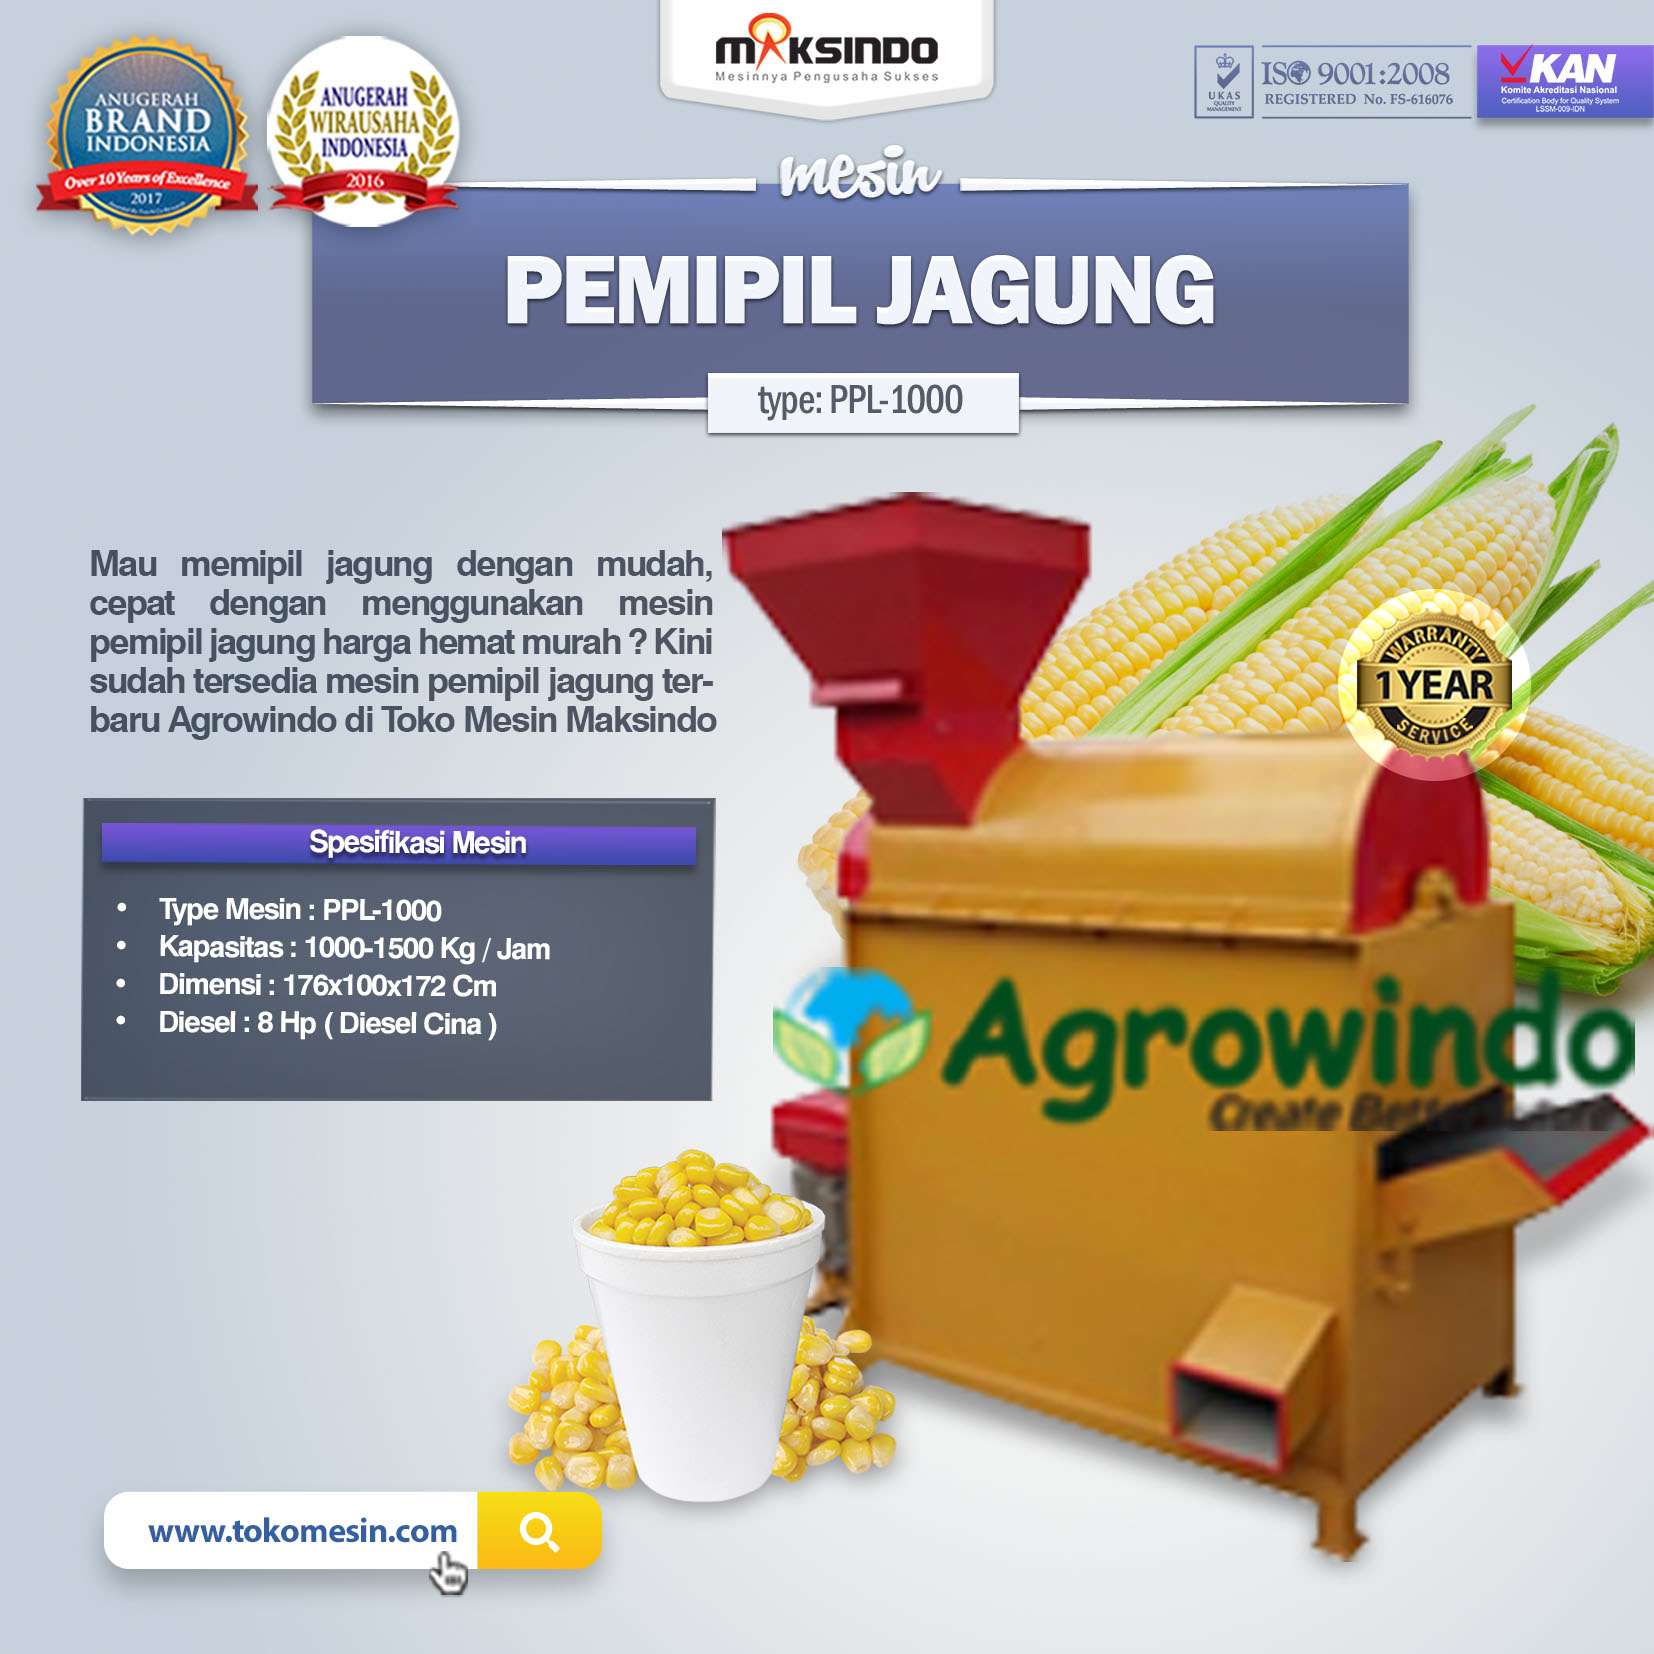 Index Of Wp Content Uploads 2017 05 Getas Super Ii Merah Isi 2 Mesin Pemipil Jagung Ppl 1000